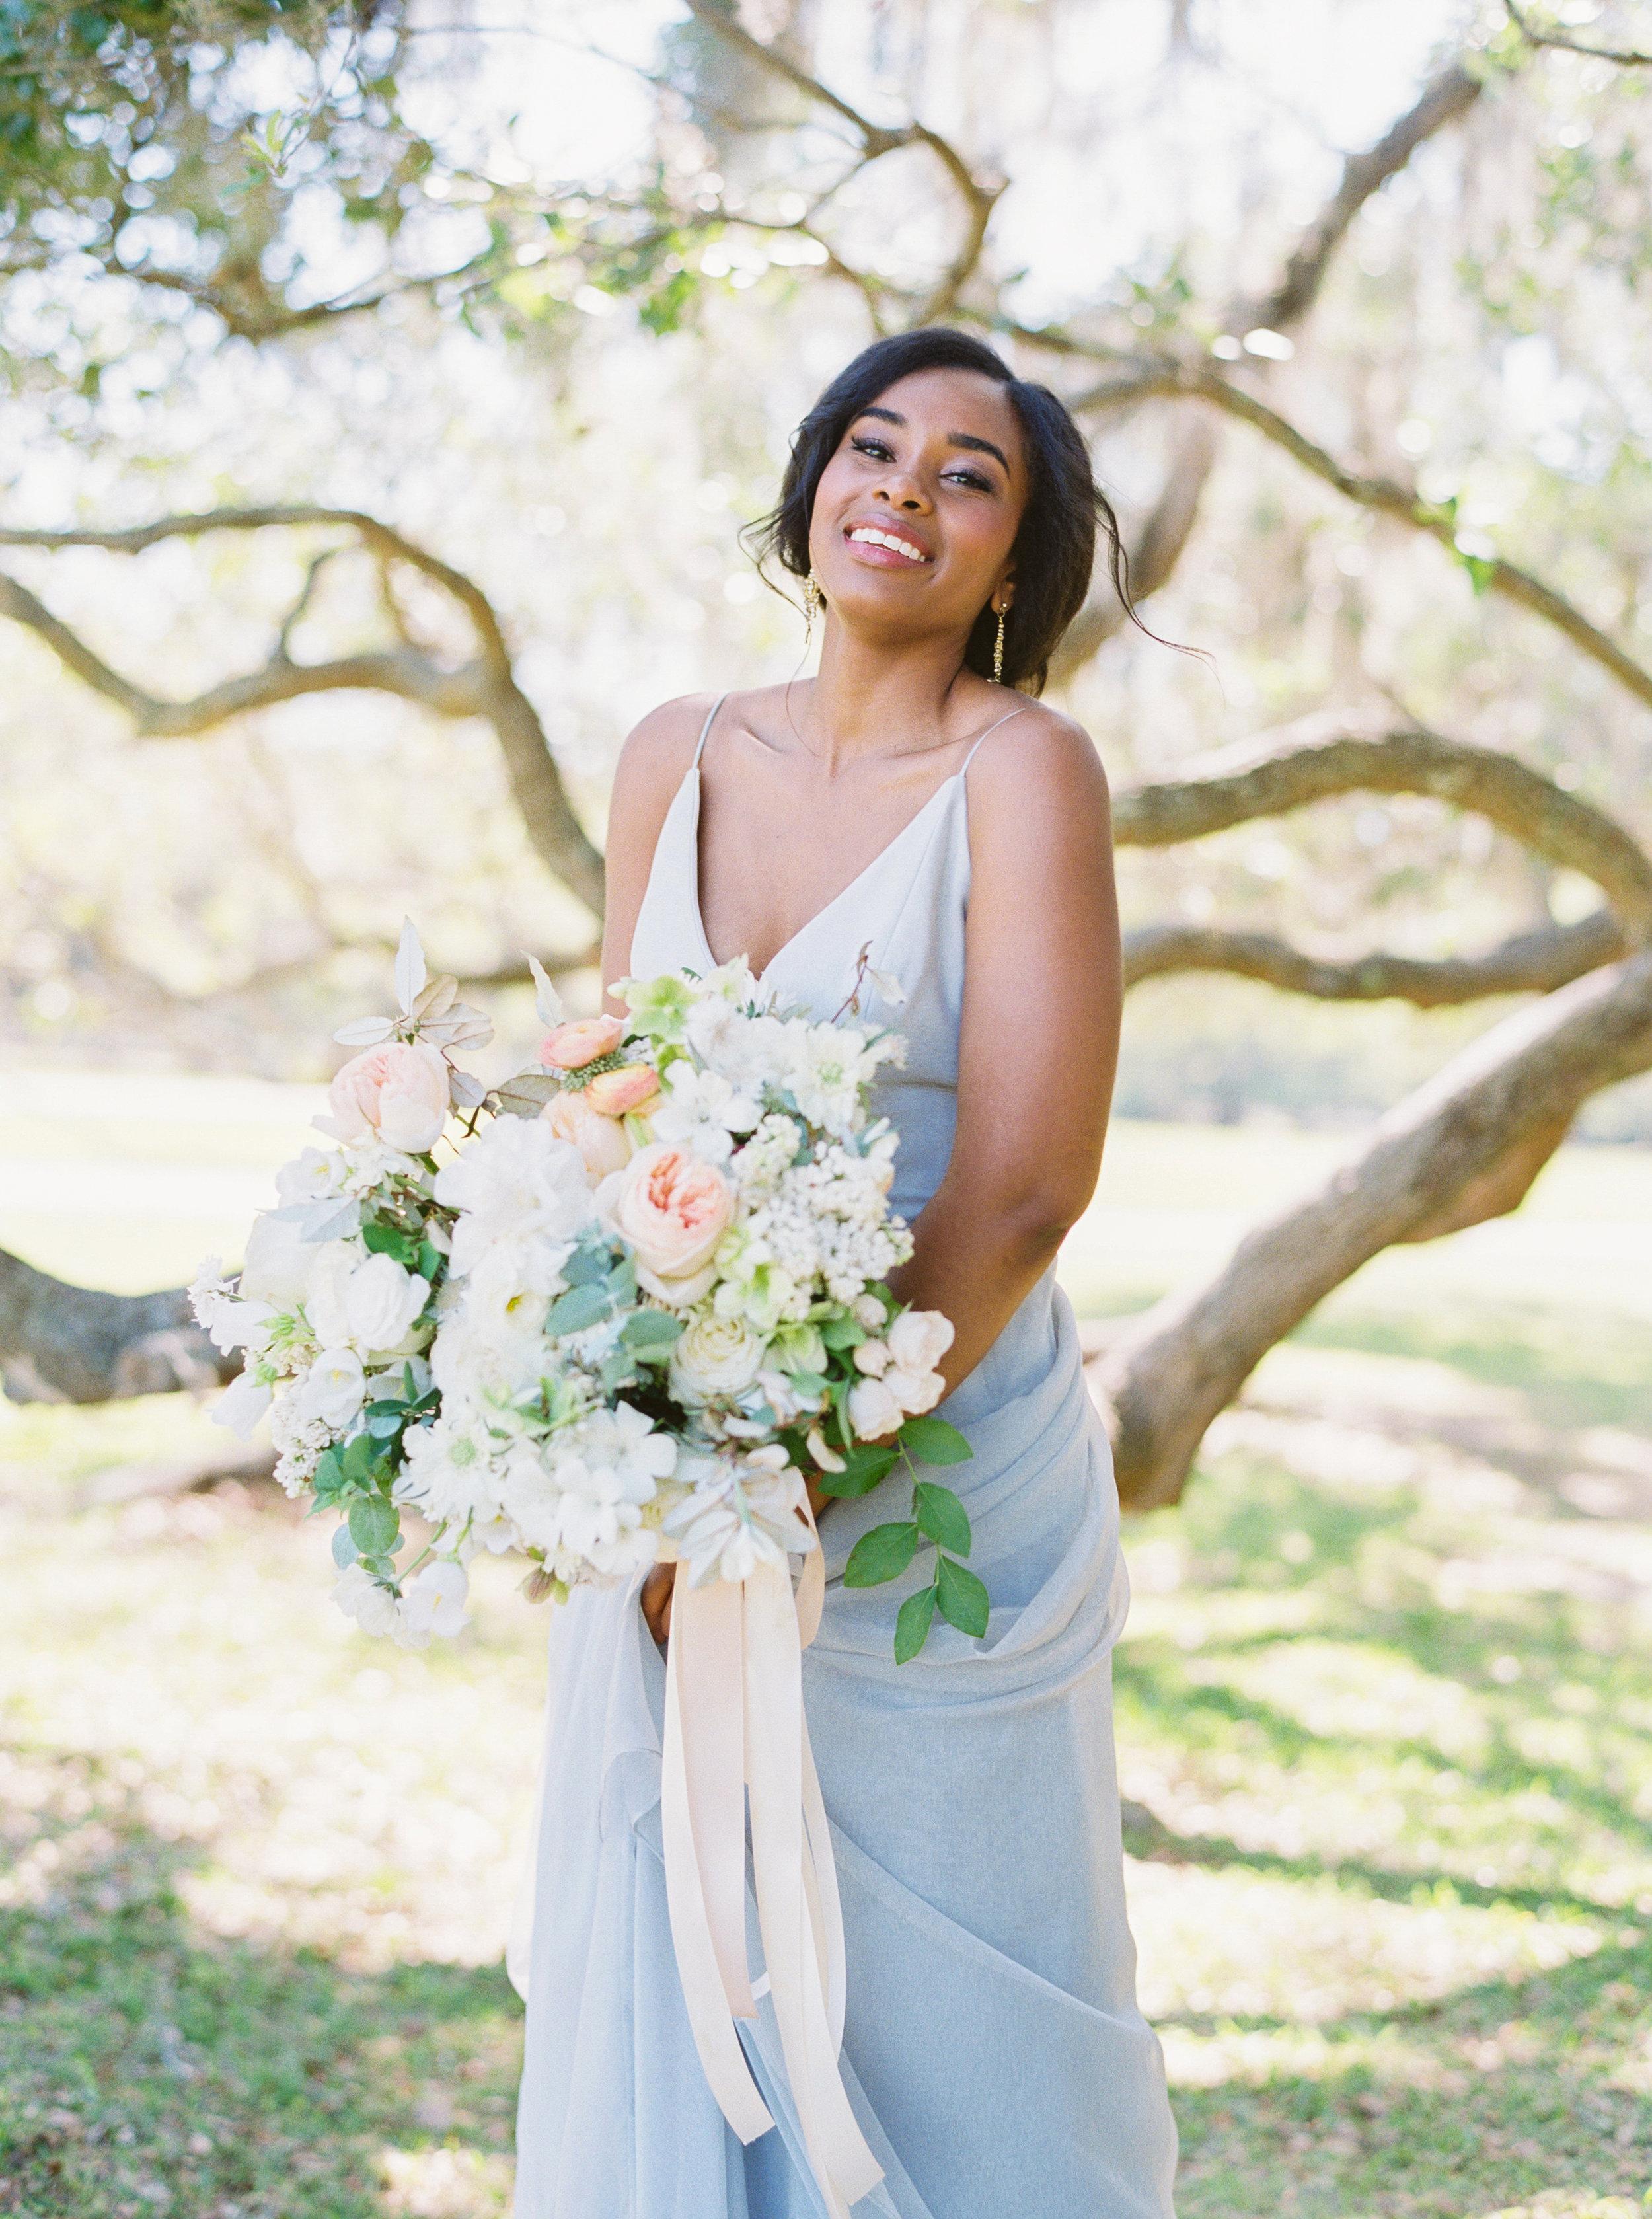 Charleston_Retreat_Kati_Rosado_Fine_Art_Film_Wedding_Photographer-30.jpg